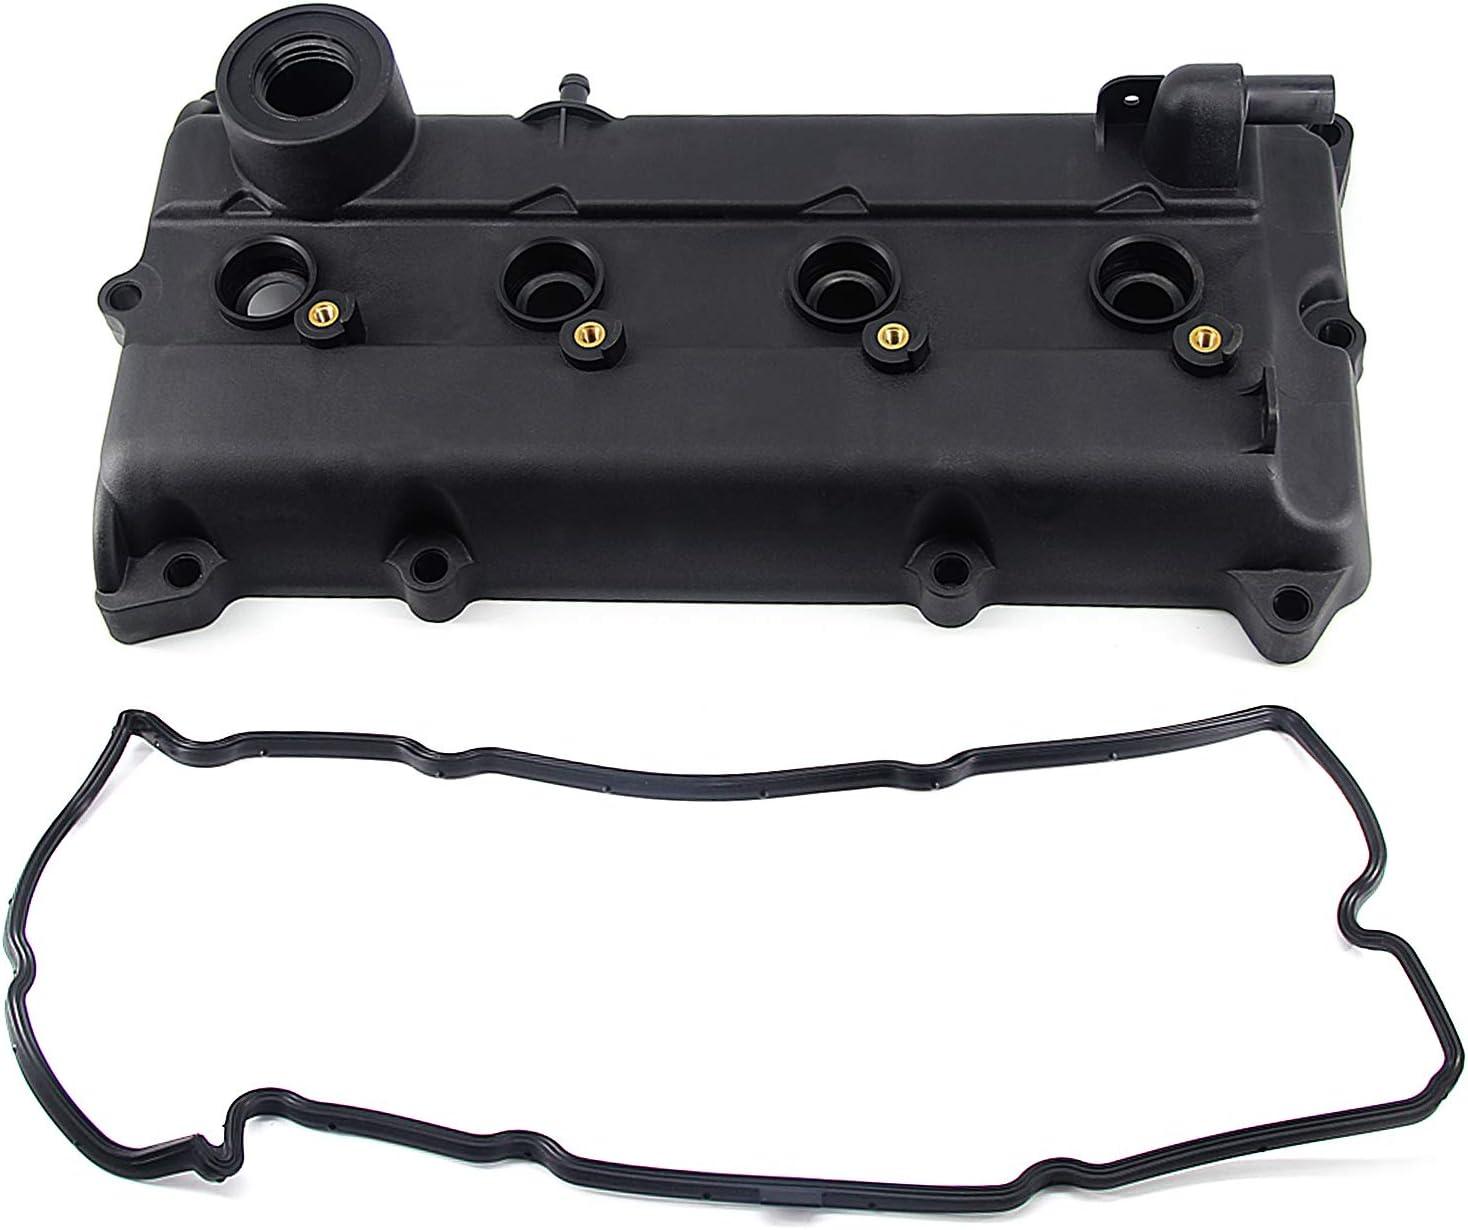 Engine Valve Cover Compatible with 2002-2006 Nissan Altima L4 152 2.5L 2002-2006 Nissan Sentra L4 2.5L 13264-3Z001 264-982